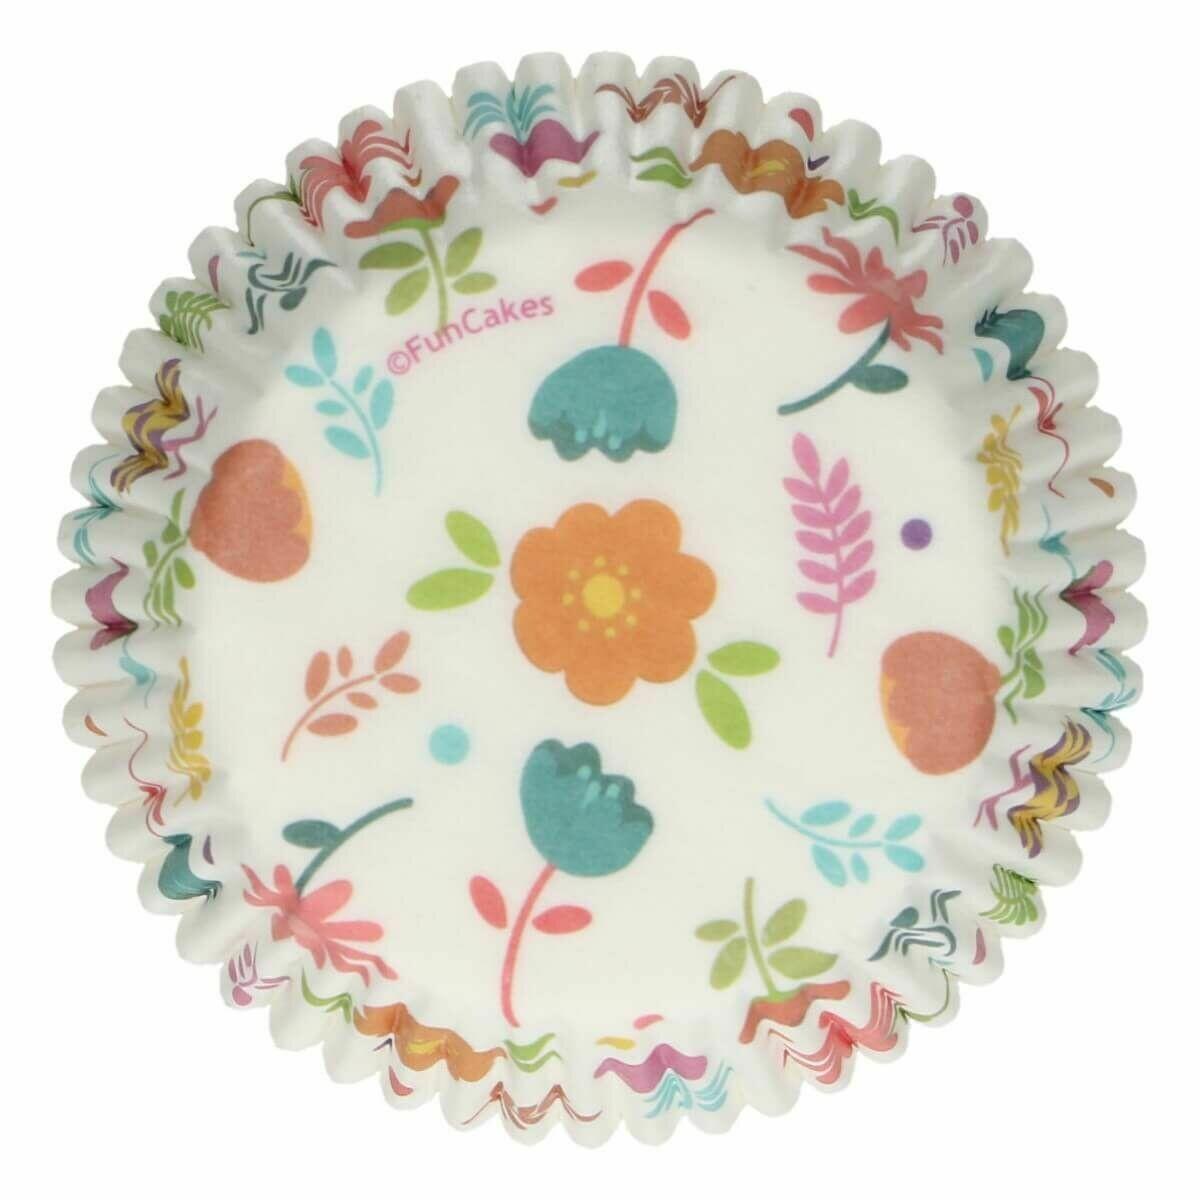 FunCakes Cupcake Cases -FLORAL -Θήκες Ψησίματος με λουλούδια 48 τεμ